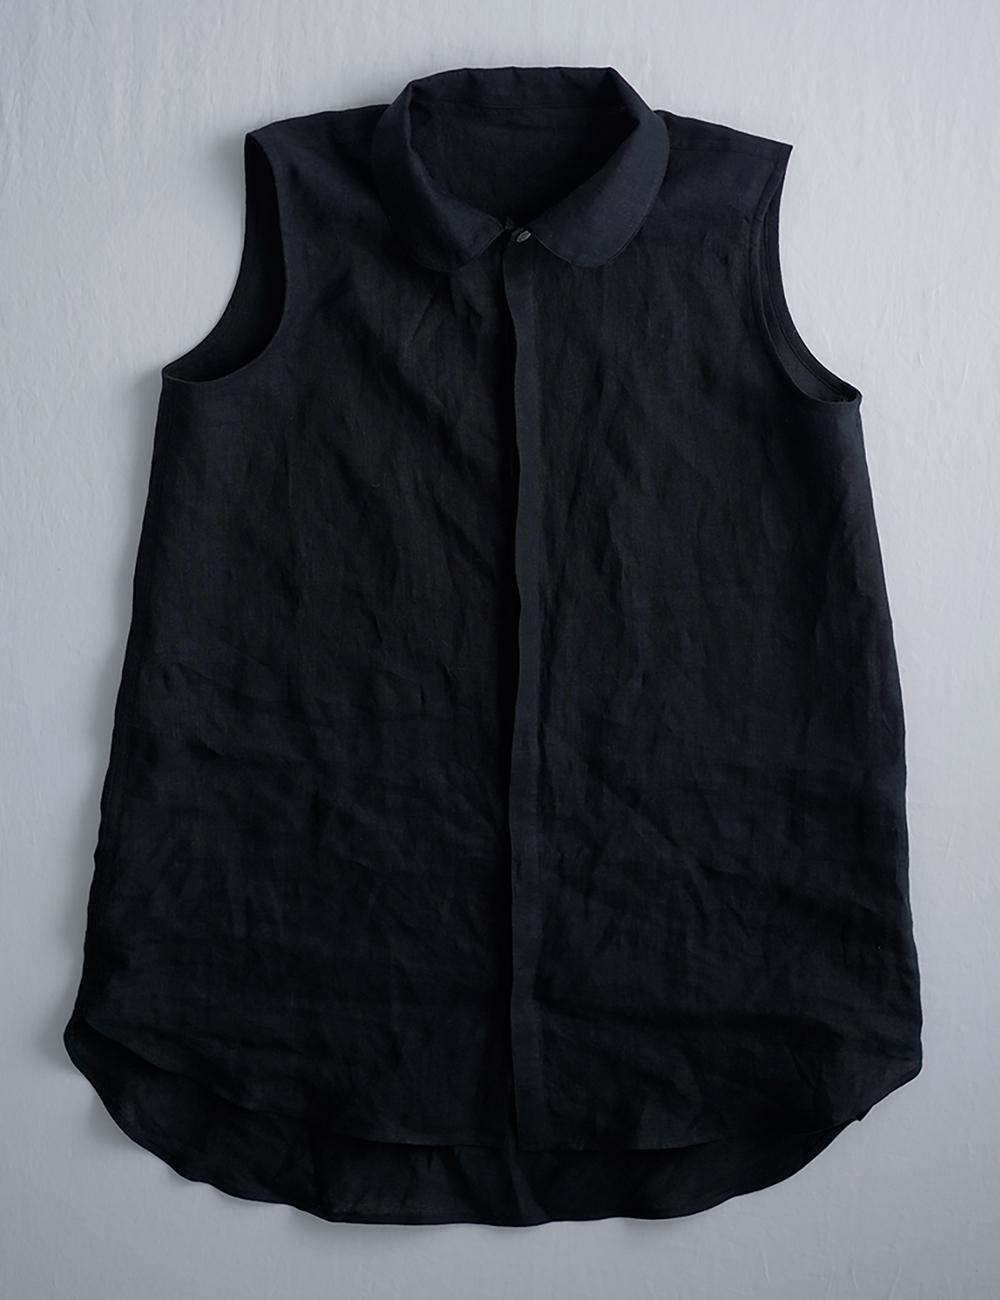 【wafu】雅亜麻 linen shirt  丸襟 比翼 シャツ  インナーとしても/黒色 p018a-bck1